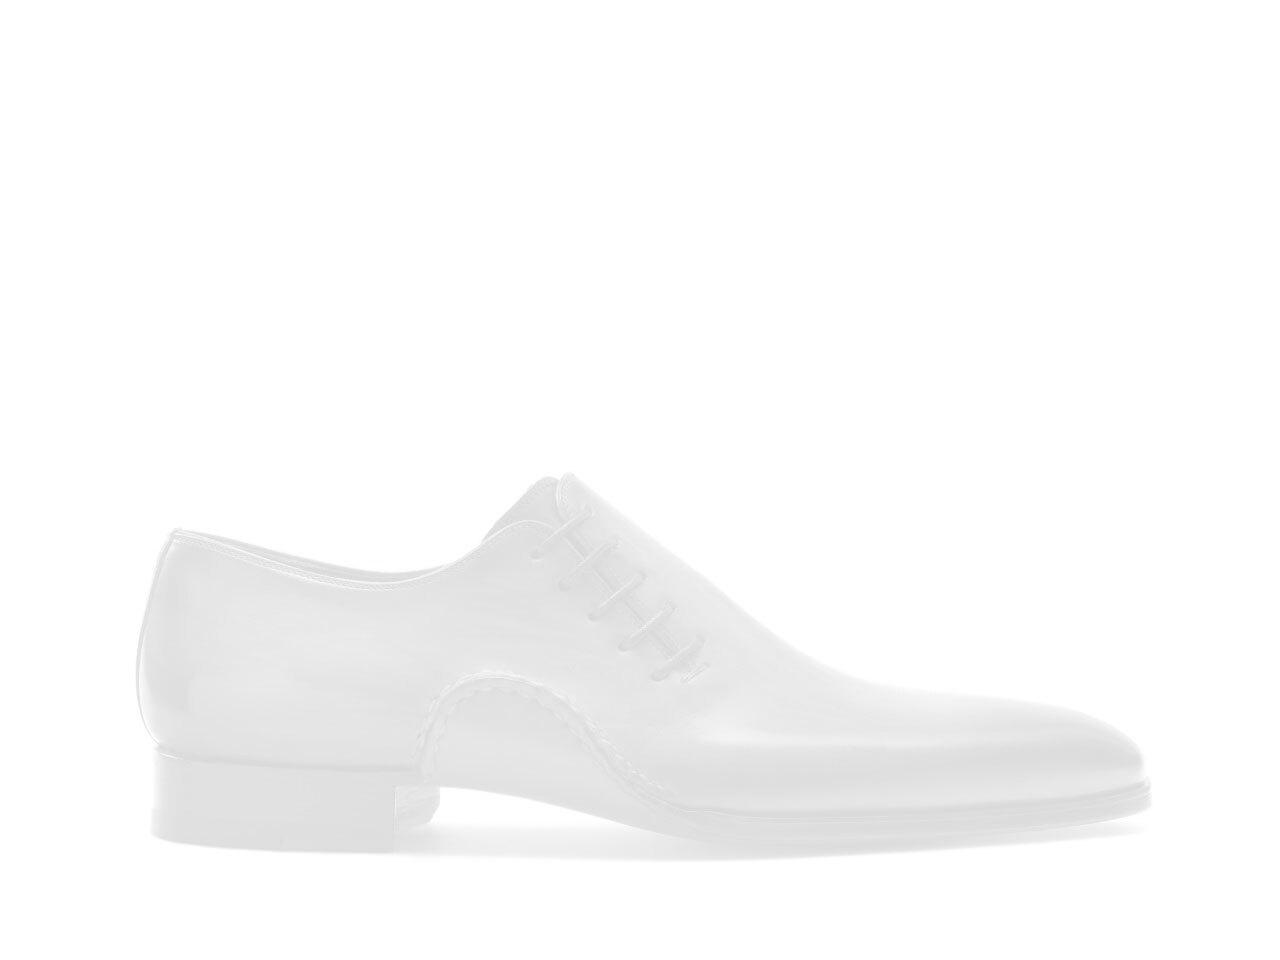 Magnanni Casual Dress Sock Lavender Men's Casual Socks